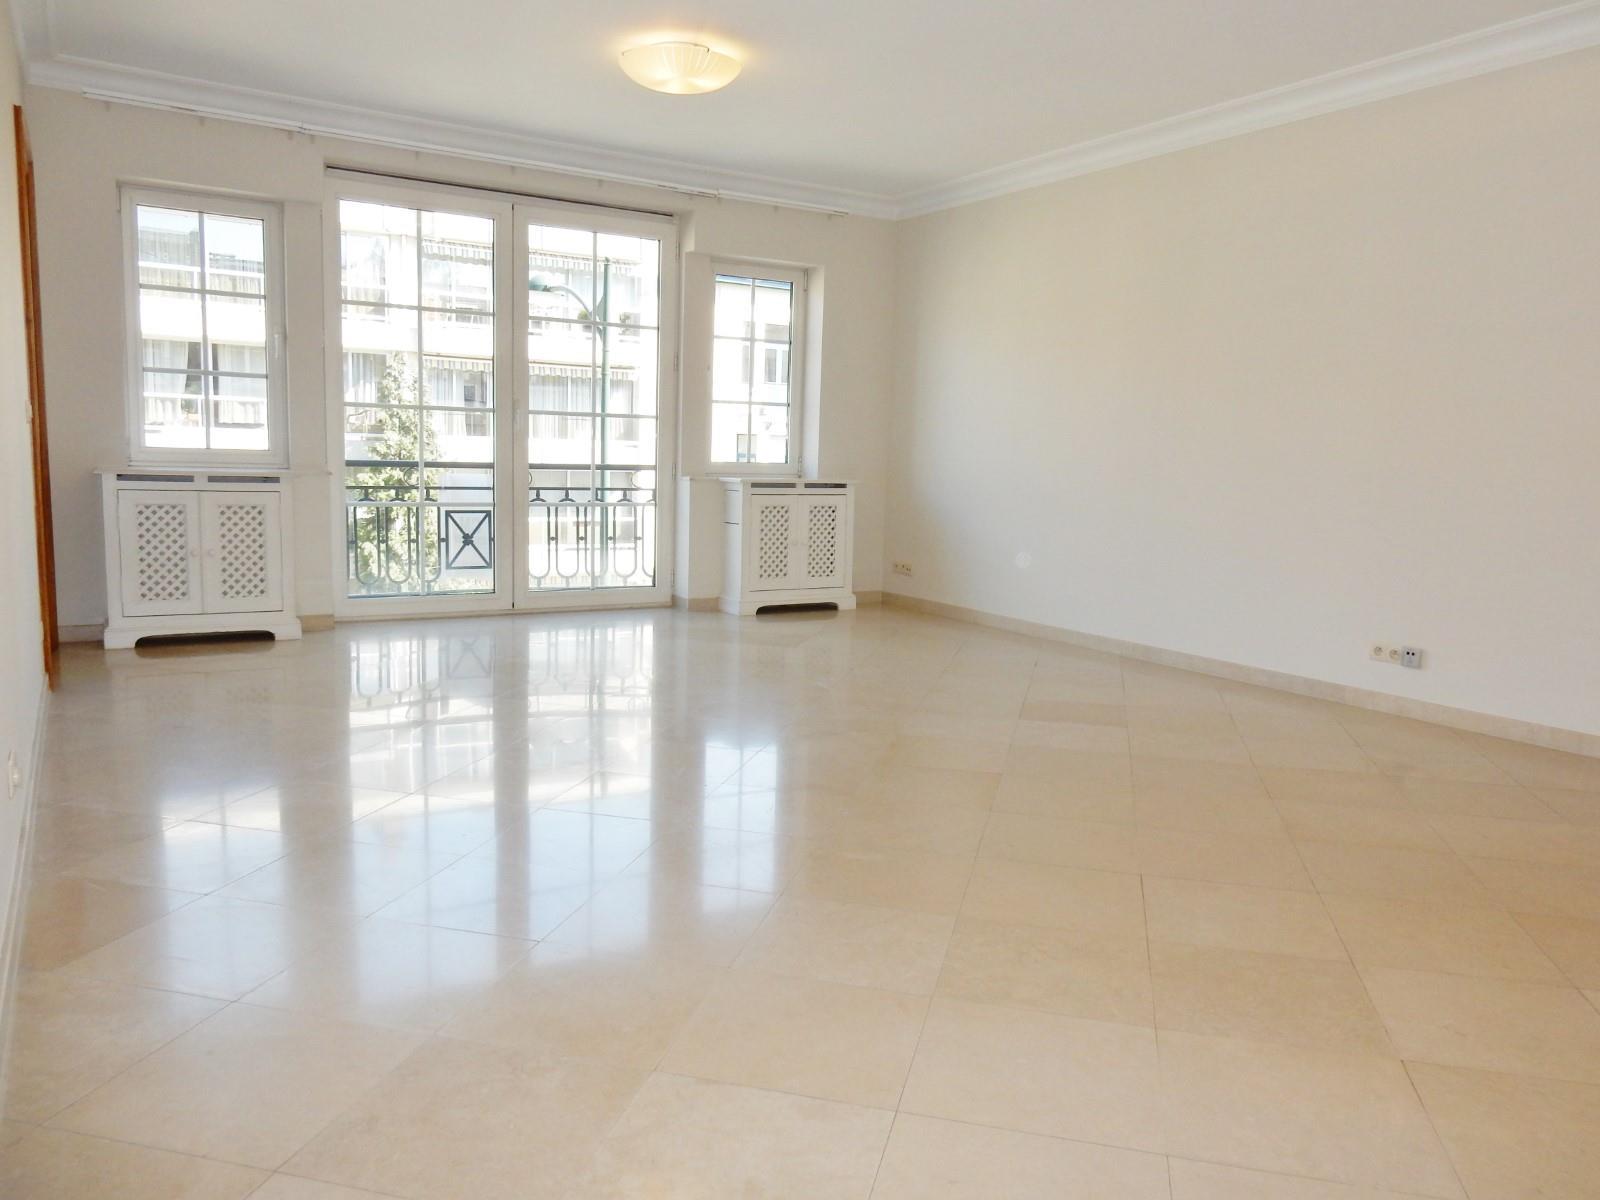 Exceptional apartment  - Woluwe-Saint-Pierre - #3201024-0